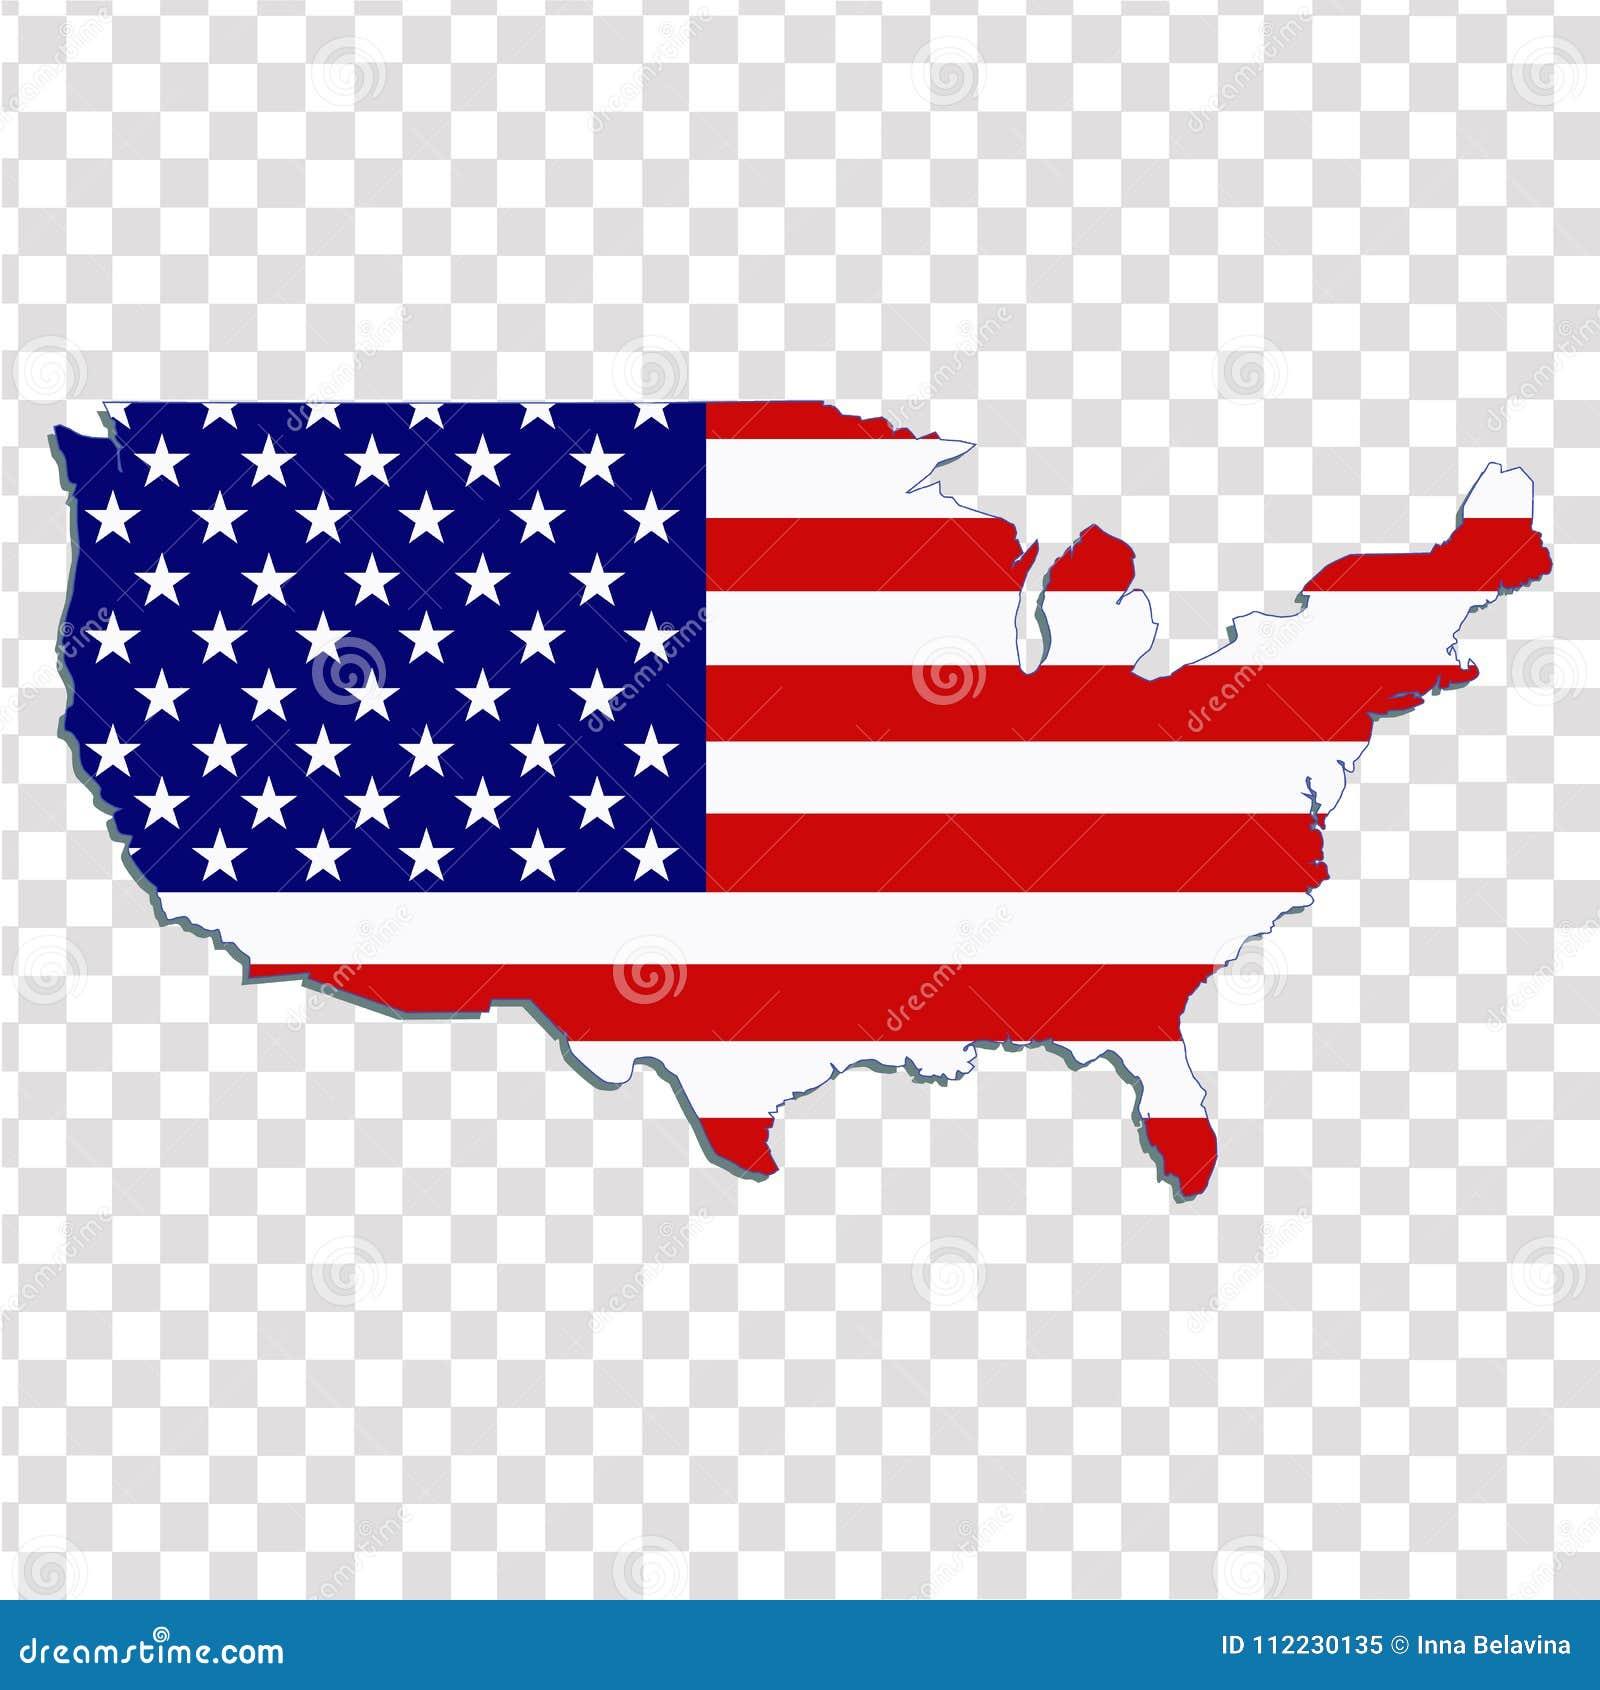 United States Of America. Illustration. Stock Vector ...